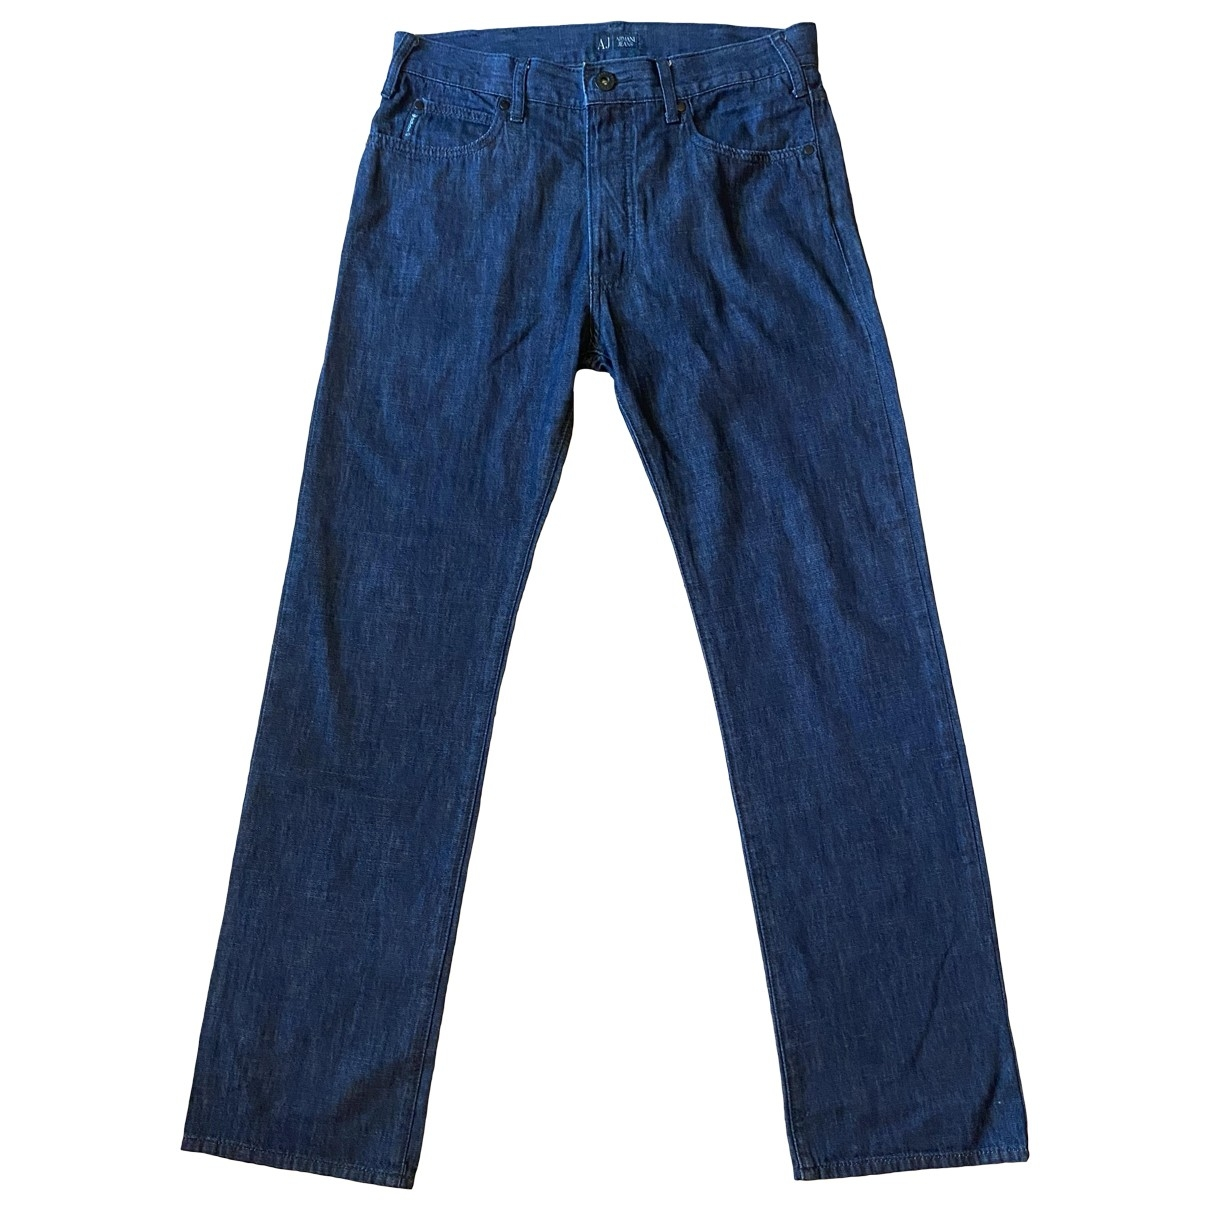 Armani Jean - Jean   pour homme en coton - bleu